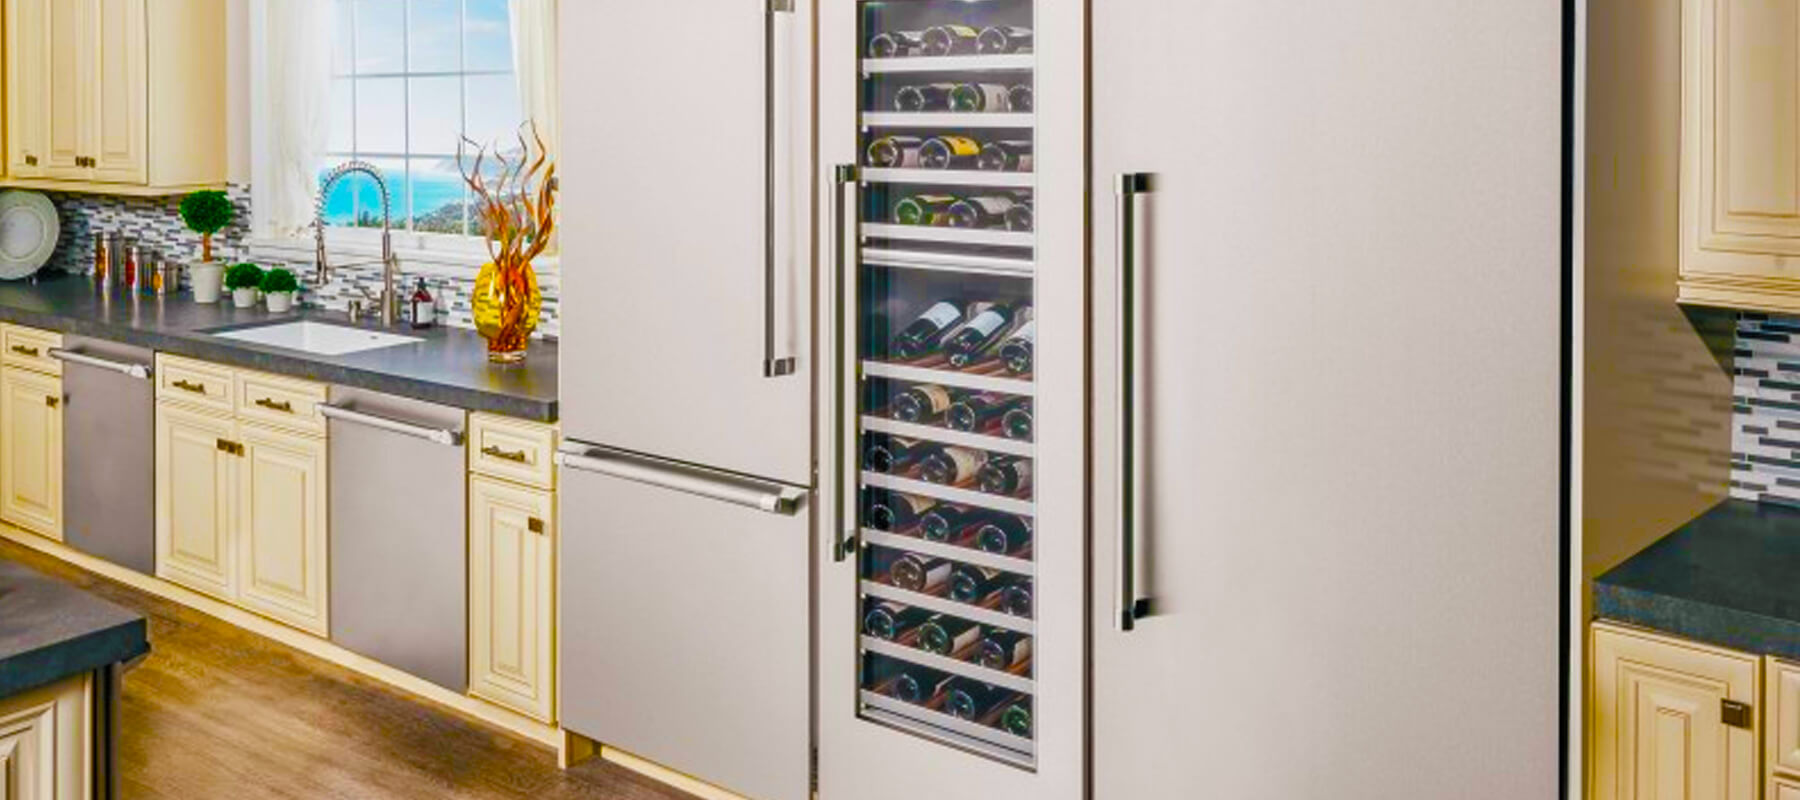 Built in Counter Depth Refrigerator Chino Hills | Built-in Refrigerator Repair